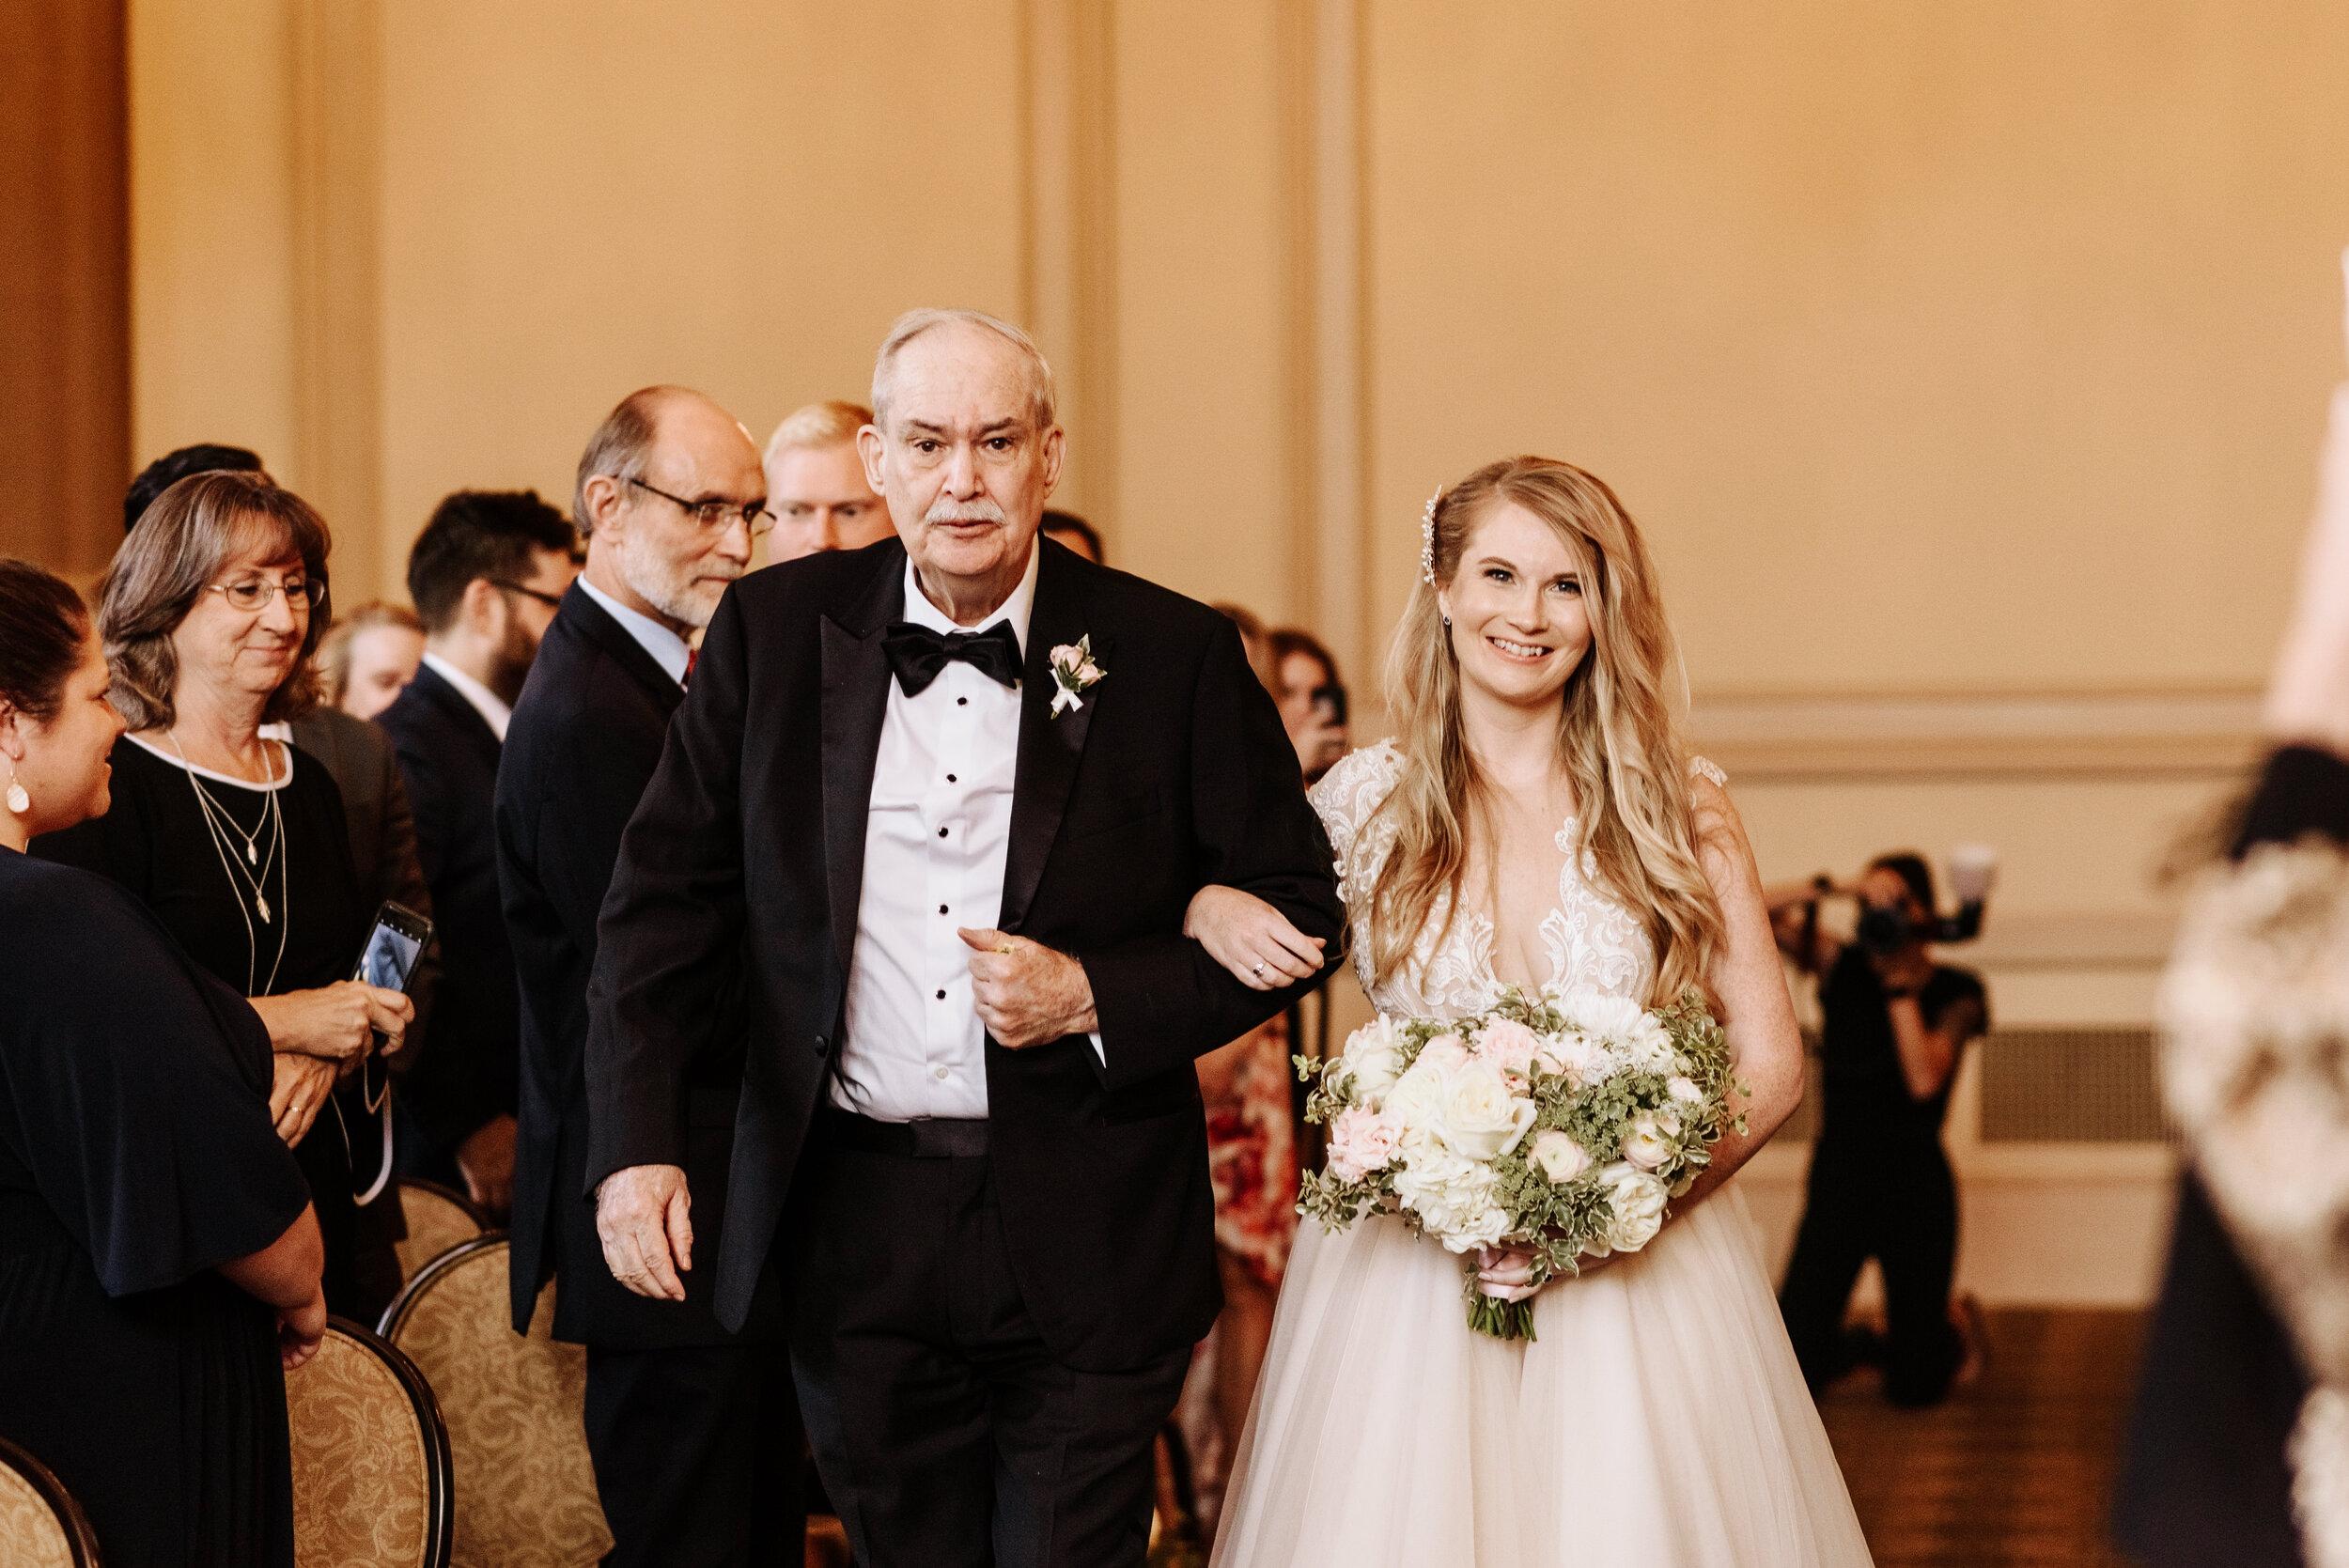 Cassie-Mrunal-Wedding-Quirk-Hotel-John-Marshall-Ballrooms-Richmond-Virginia-Photography-by-V-70.jpg